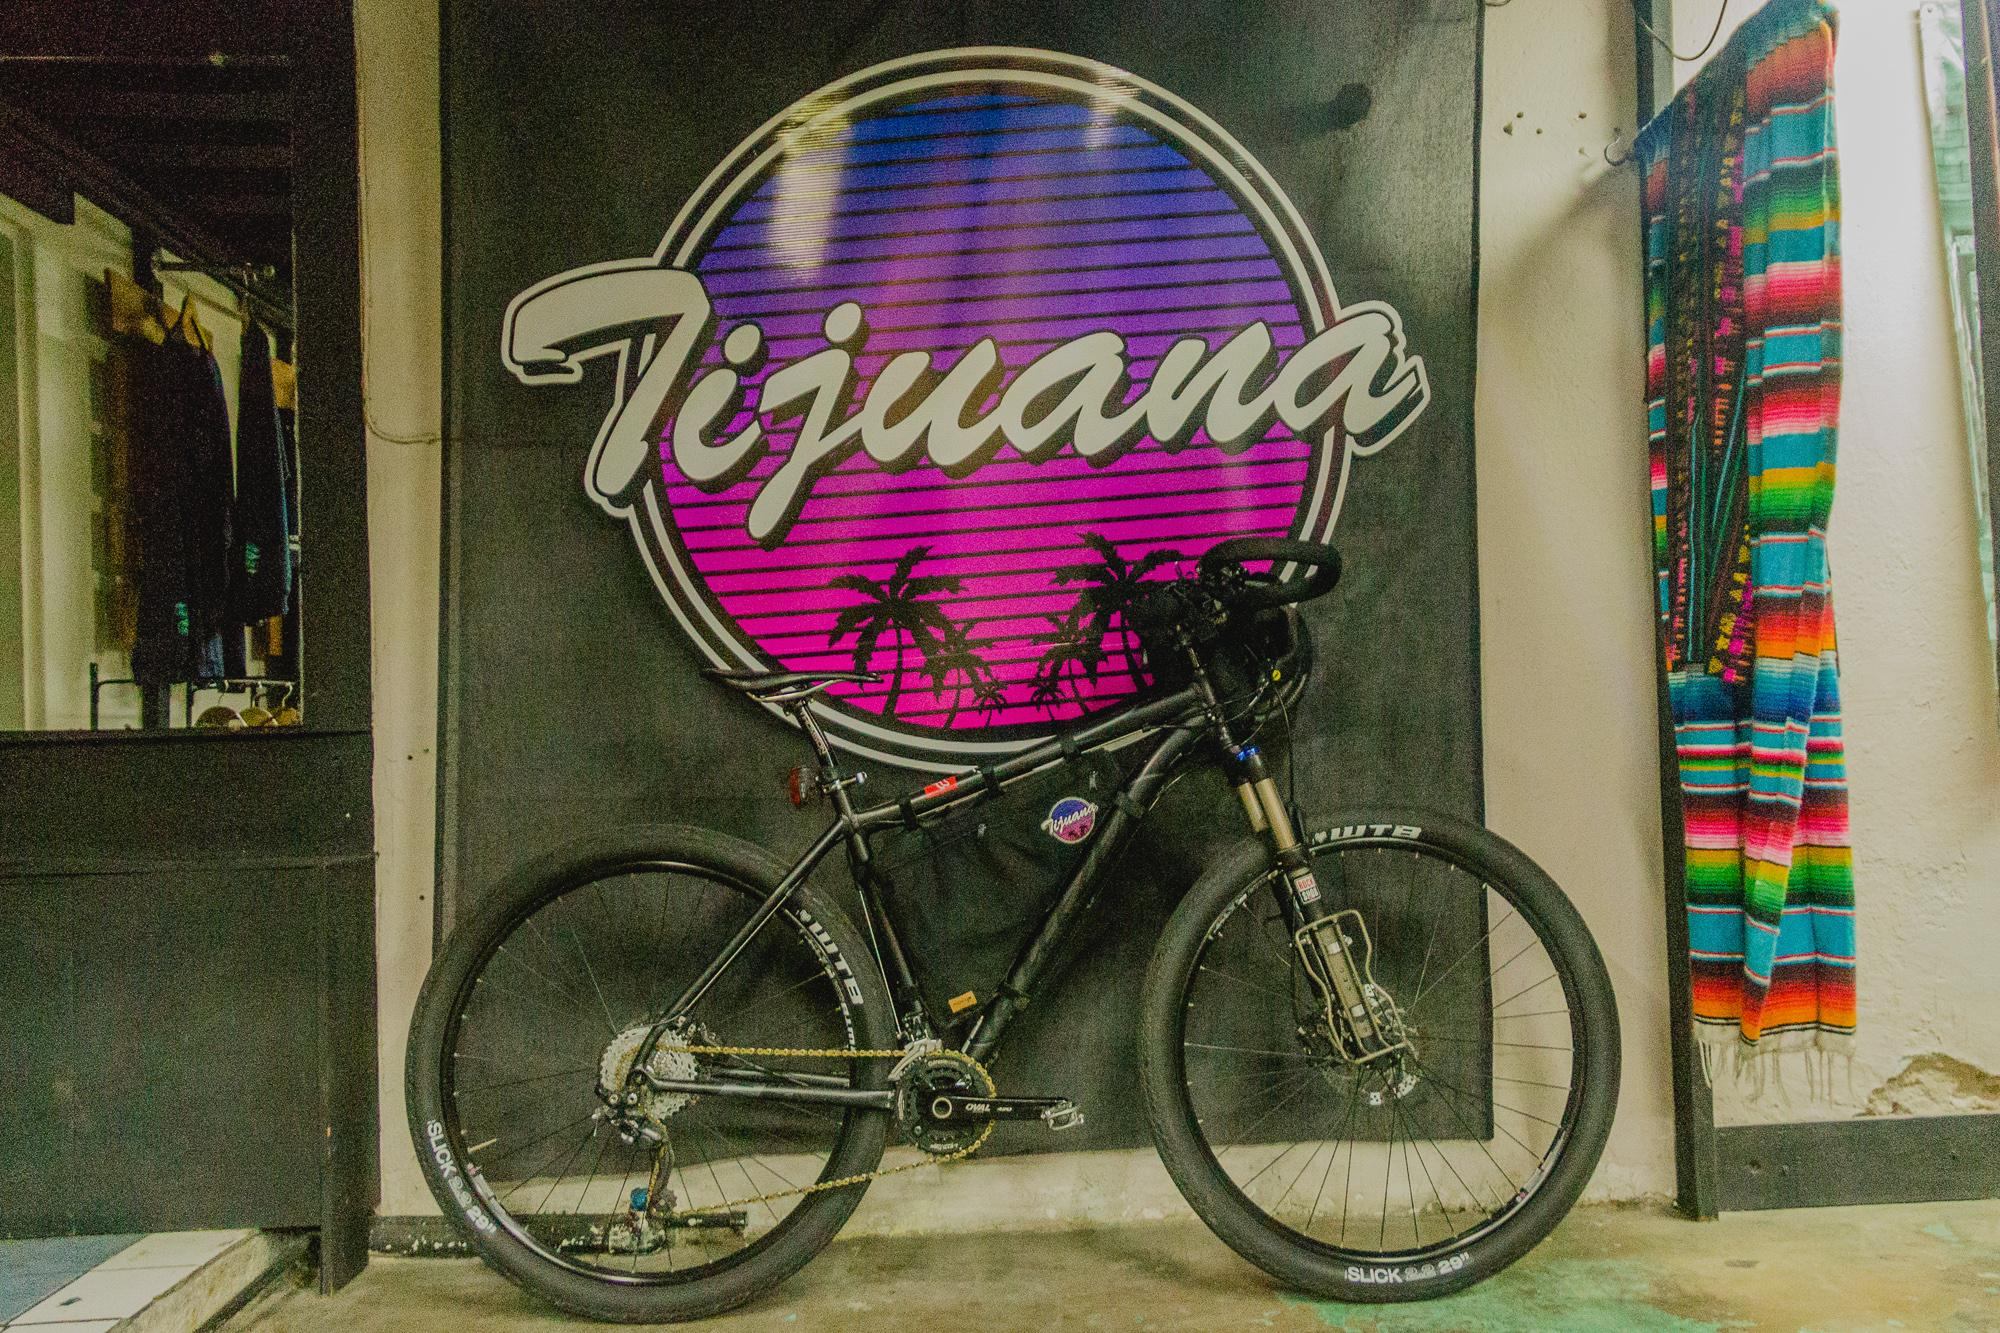 18. A Movigo frame bag on a bike that_s currently on a trip across México_